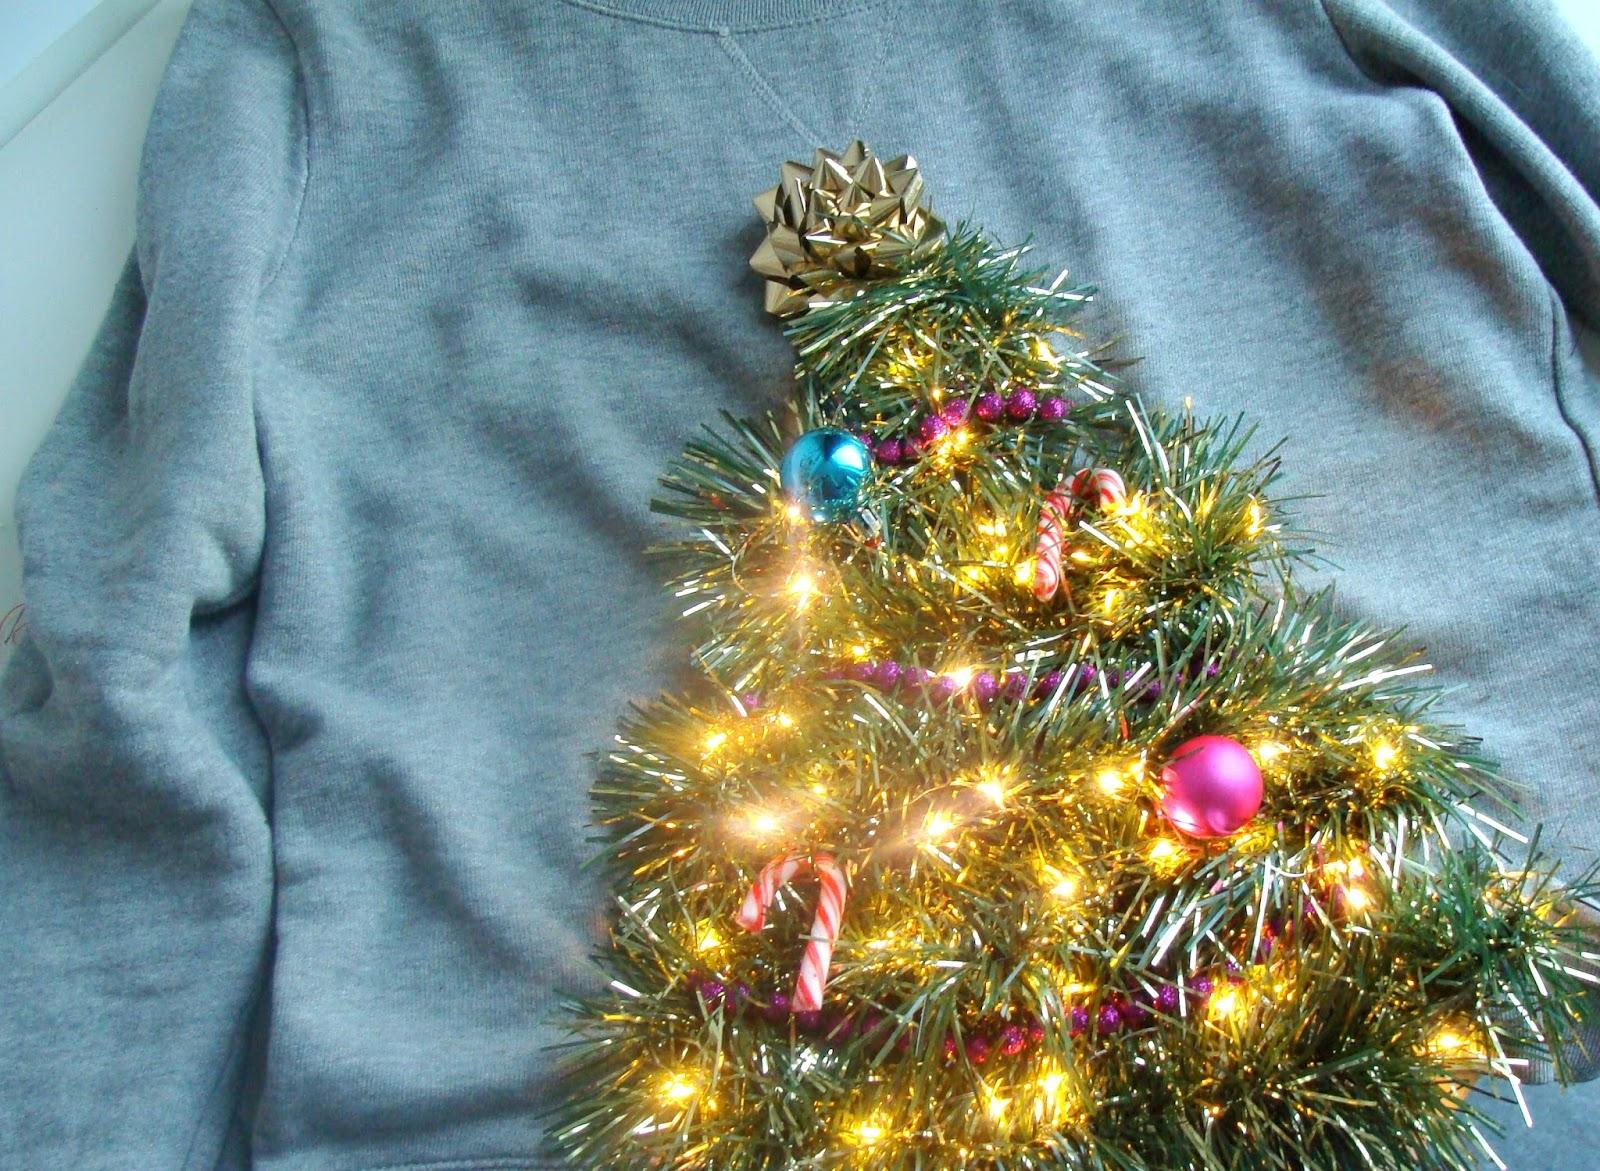 Foute Kersttrui Borrel.Diy Foute Kersttrui Querantine